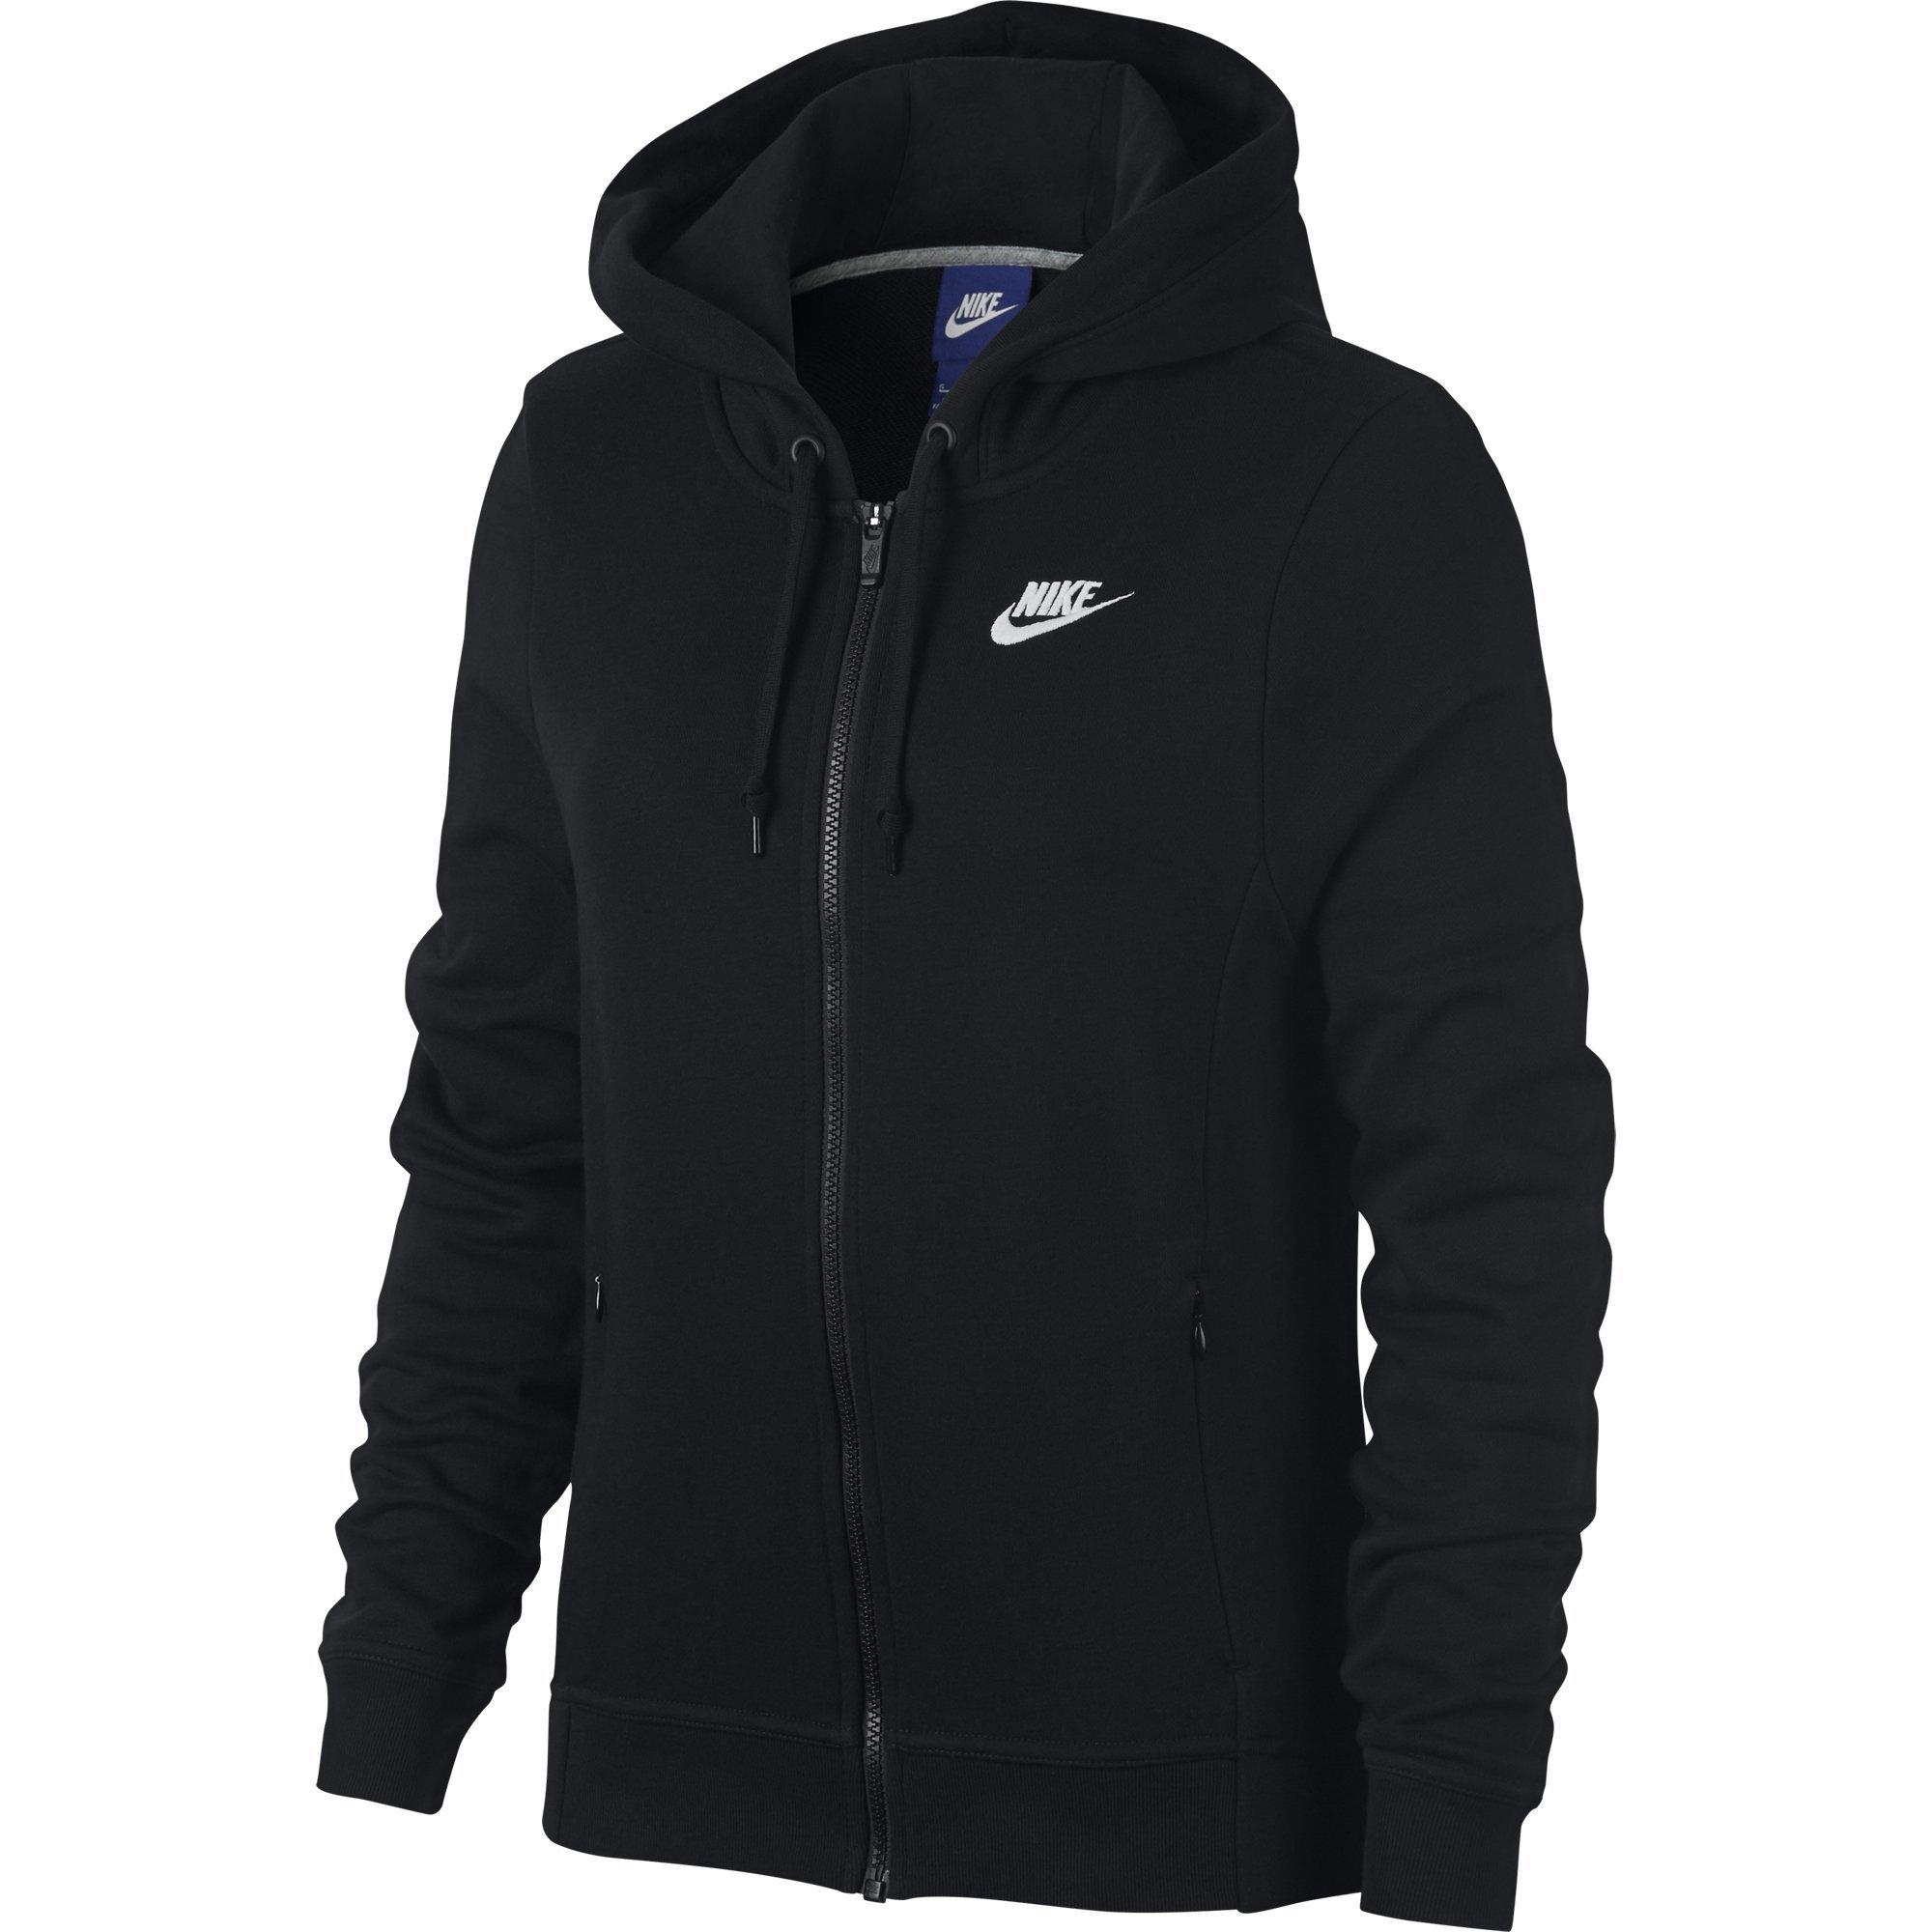 NIKE Sportswear Women's Full Zip Hoodie, Black/Black/Black/White, Medium